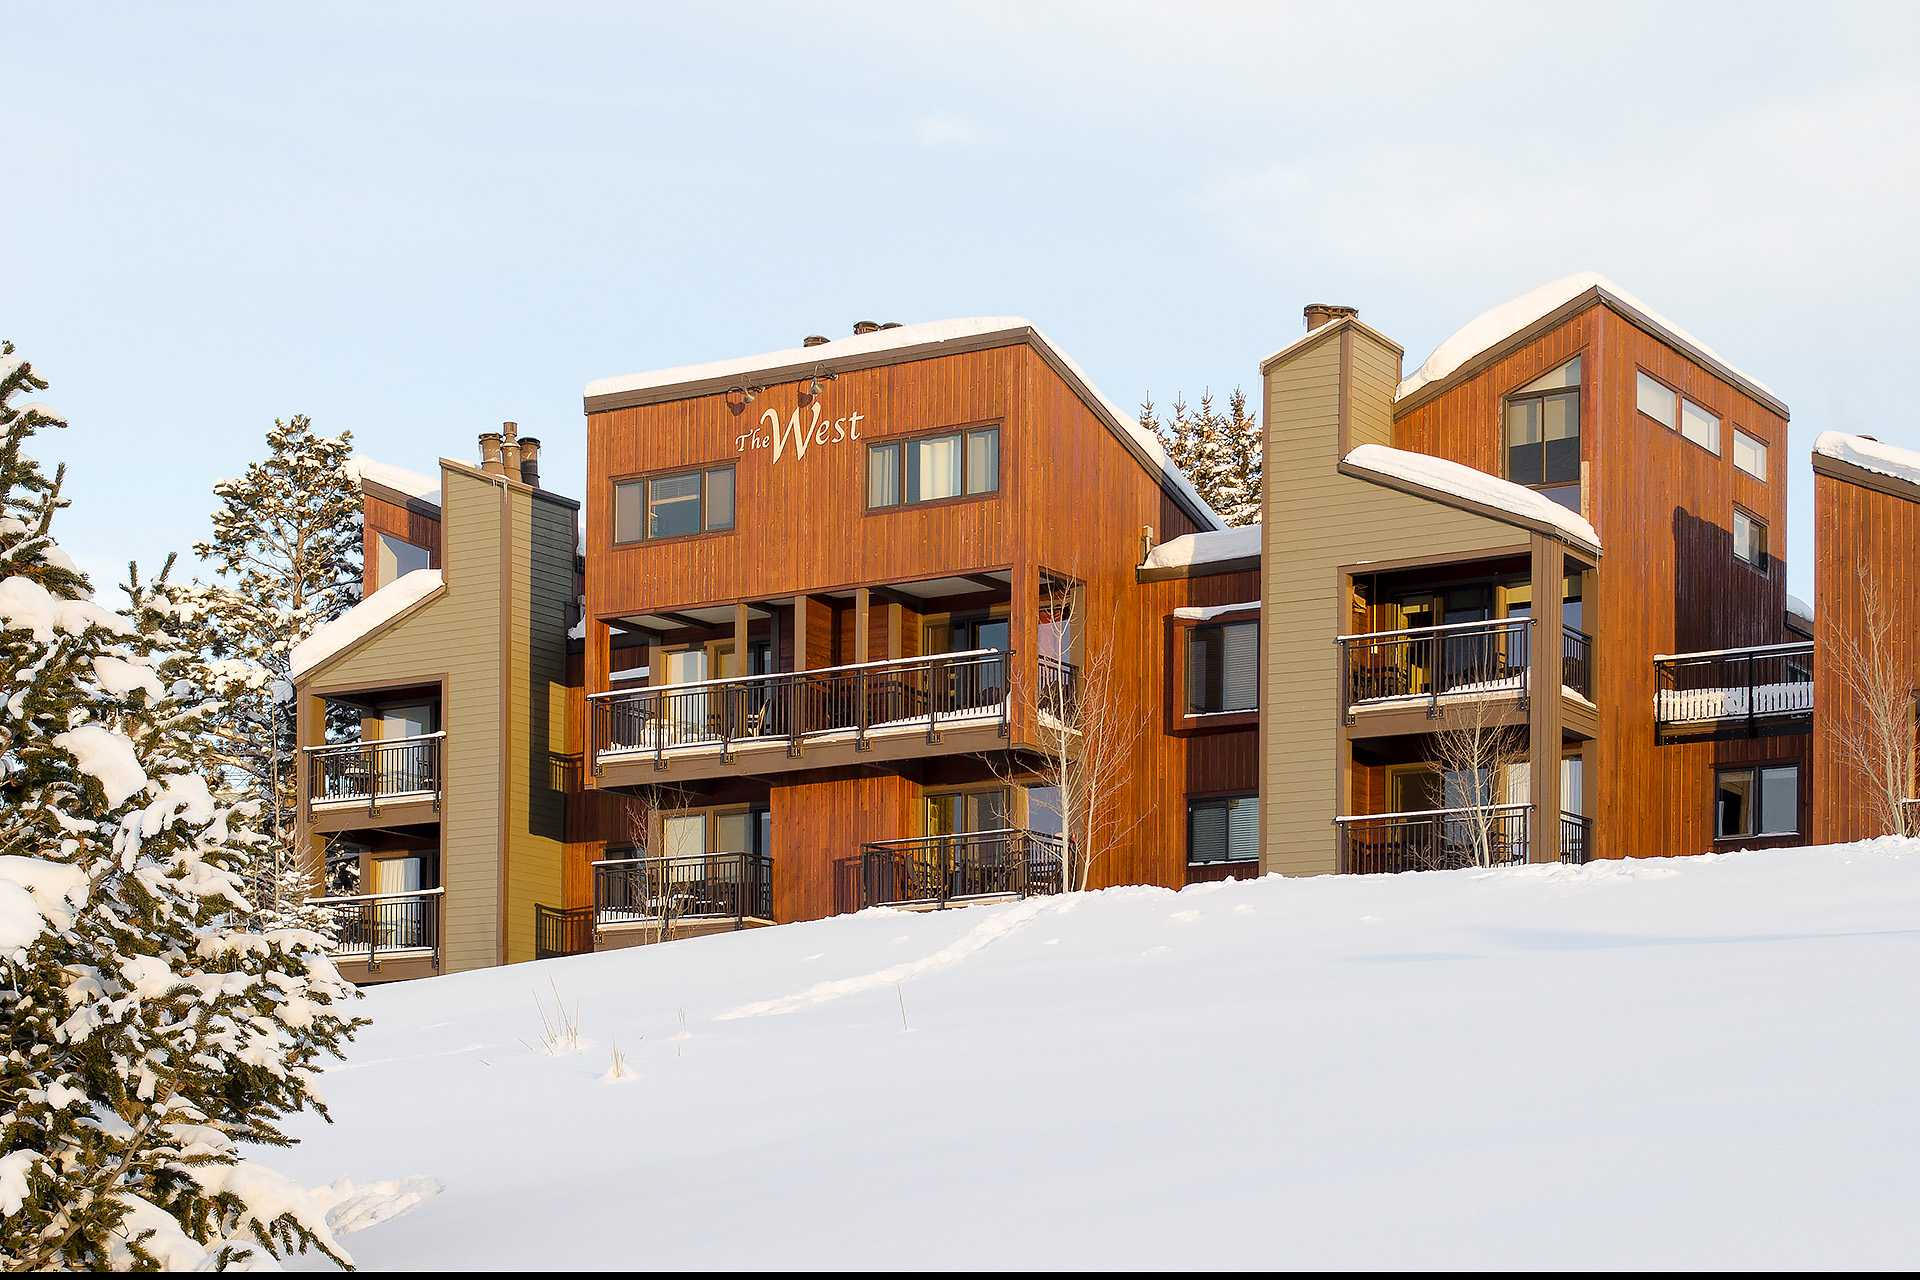 W3240: The West Condominiums